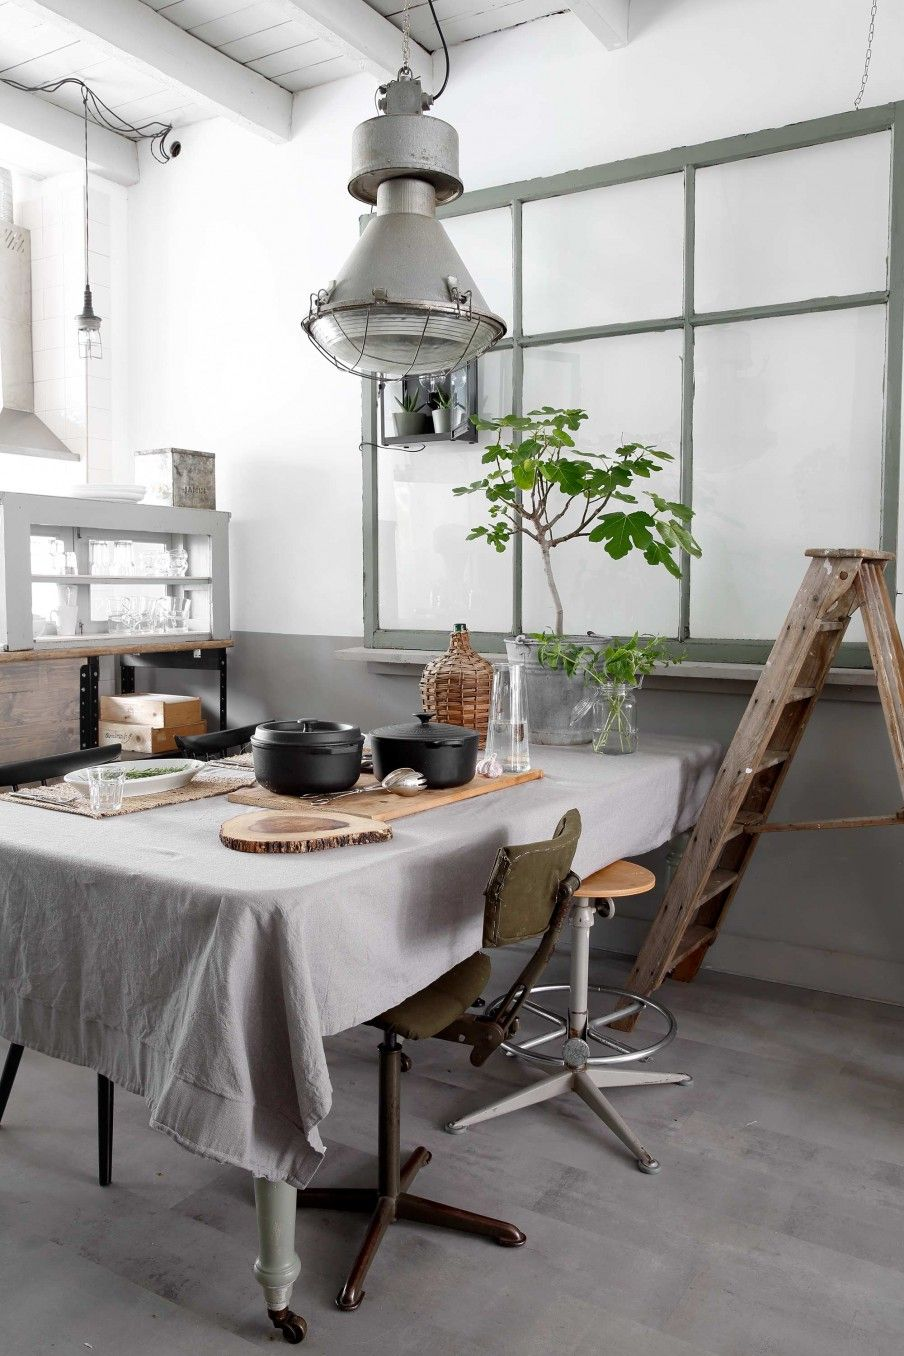 botanische eetkamer botanic diningroom 12 2016 photography peggy janssen industrial chicvintage industrialindustrial interiorshouse - Industrial House 2016